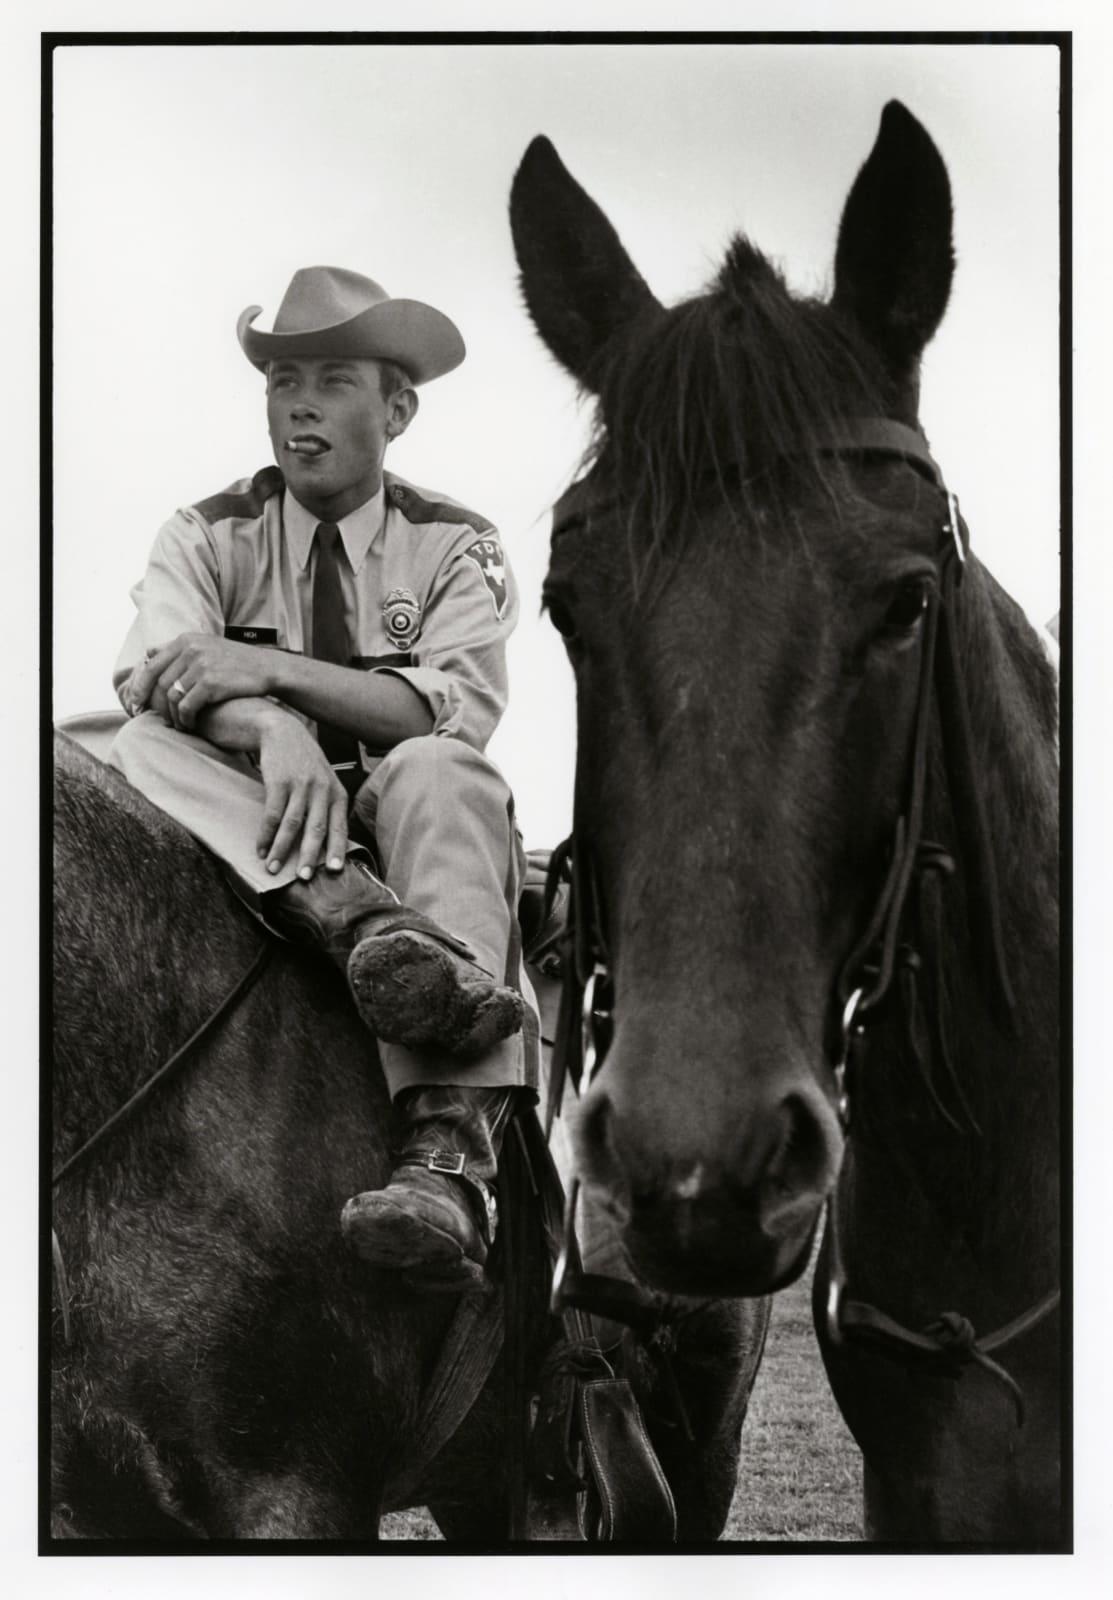 Danny Lyon - Boss, Ellis Unit, Texas Department Of Corrections, 1968